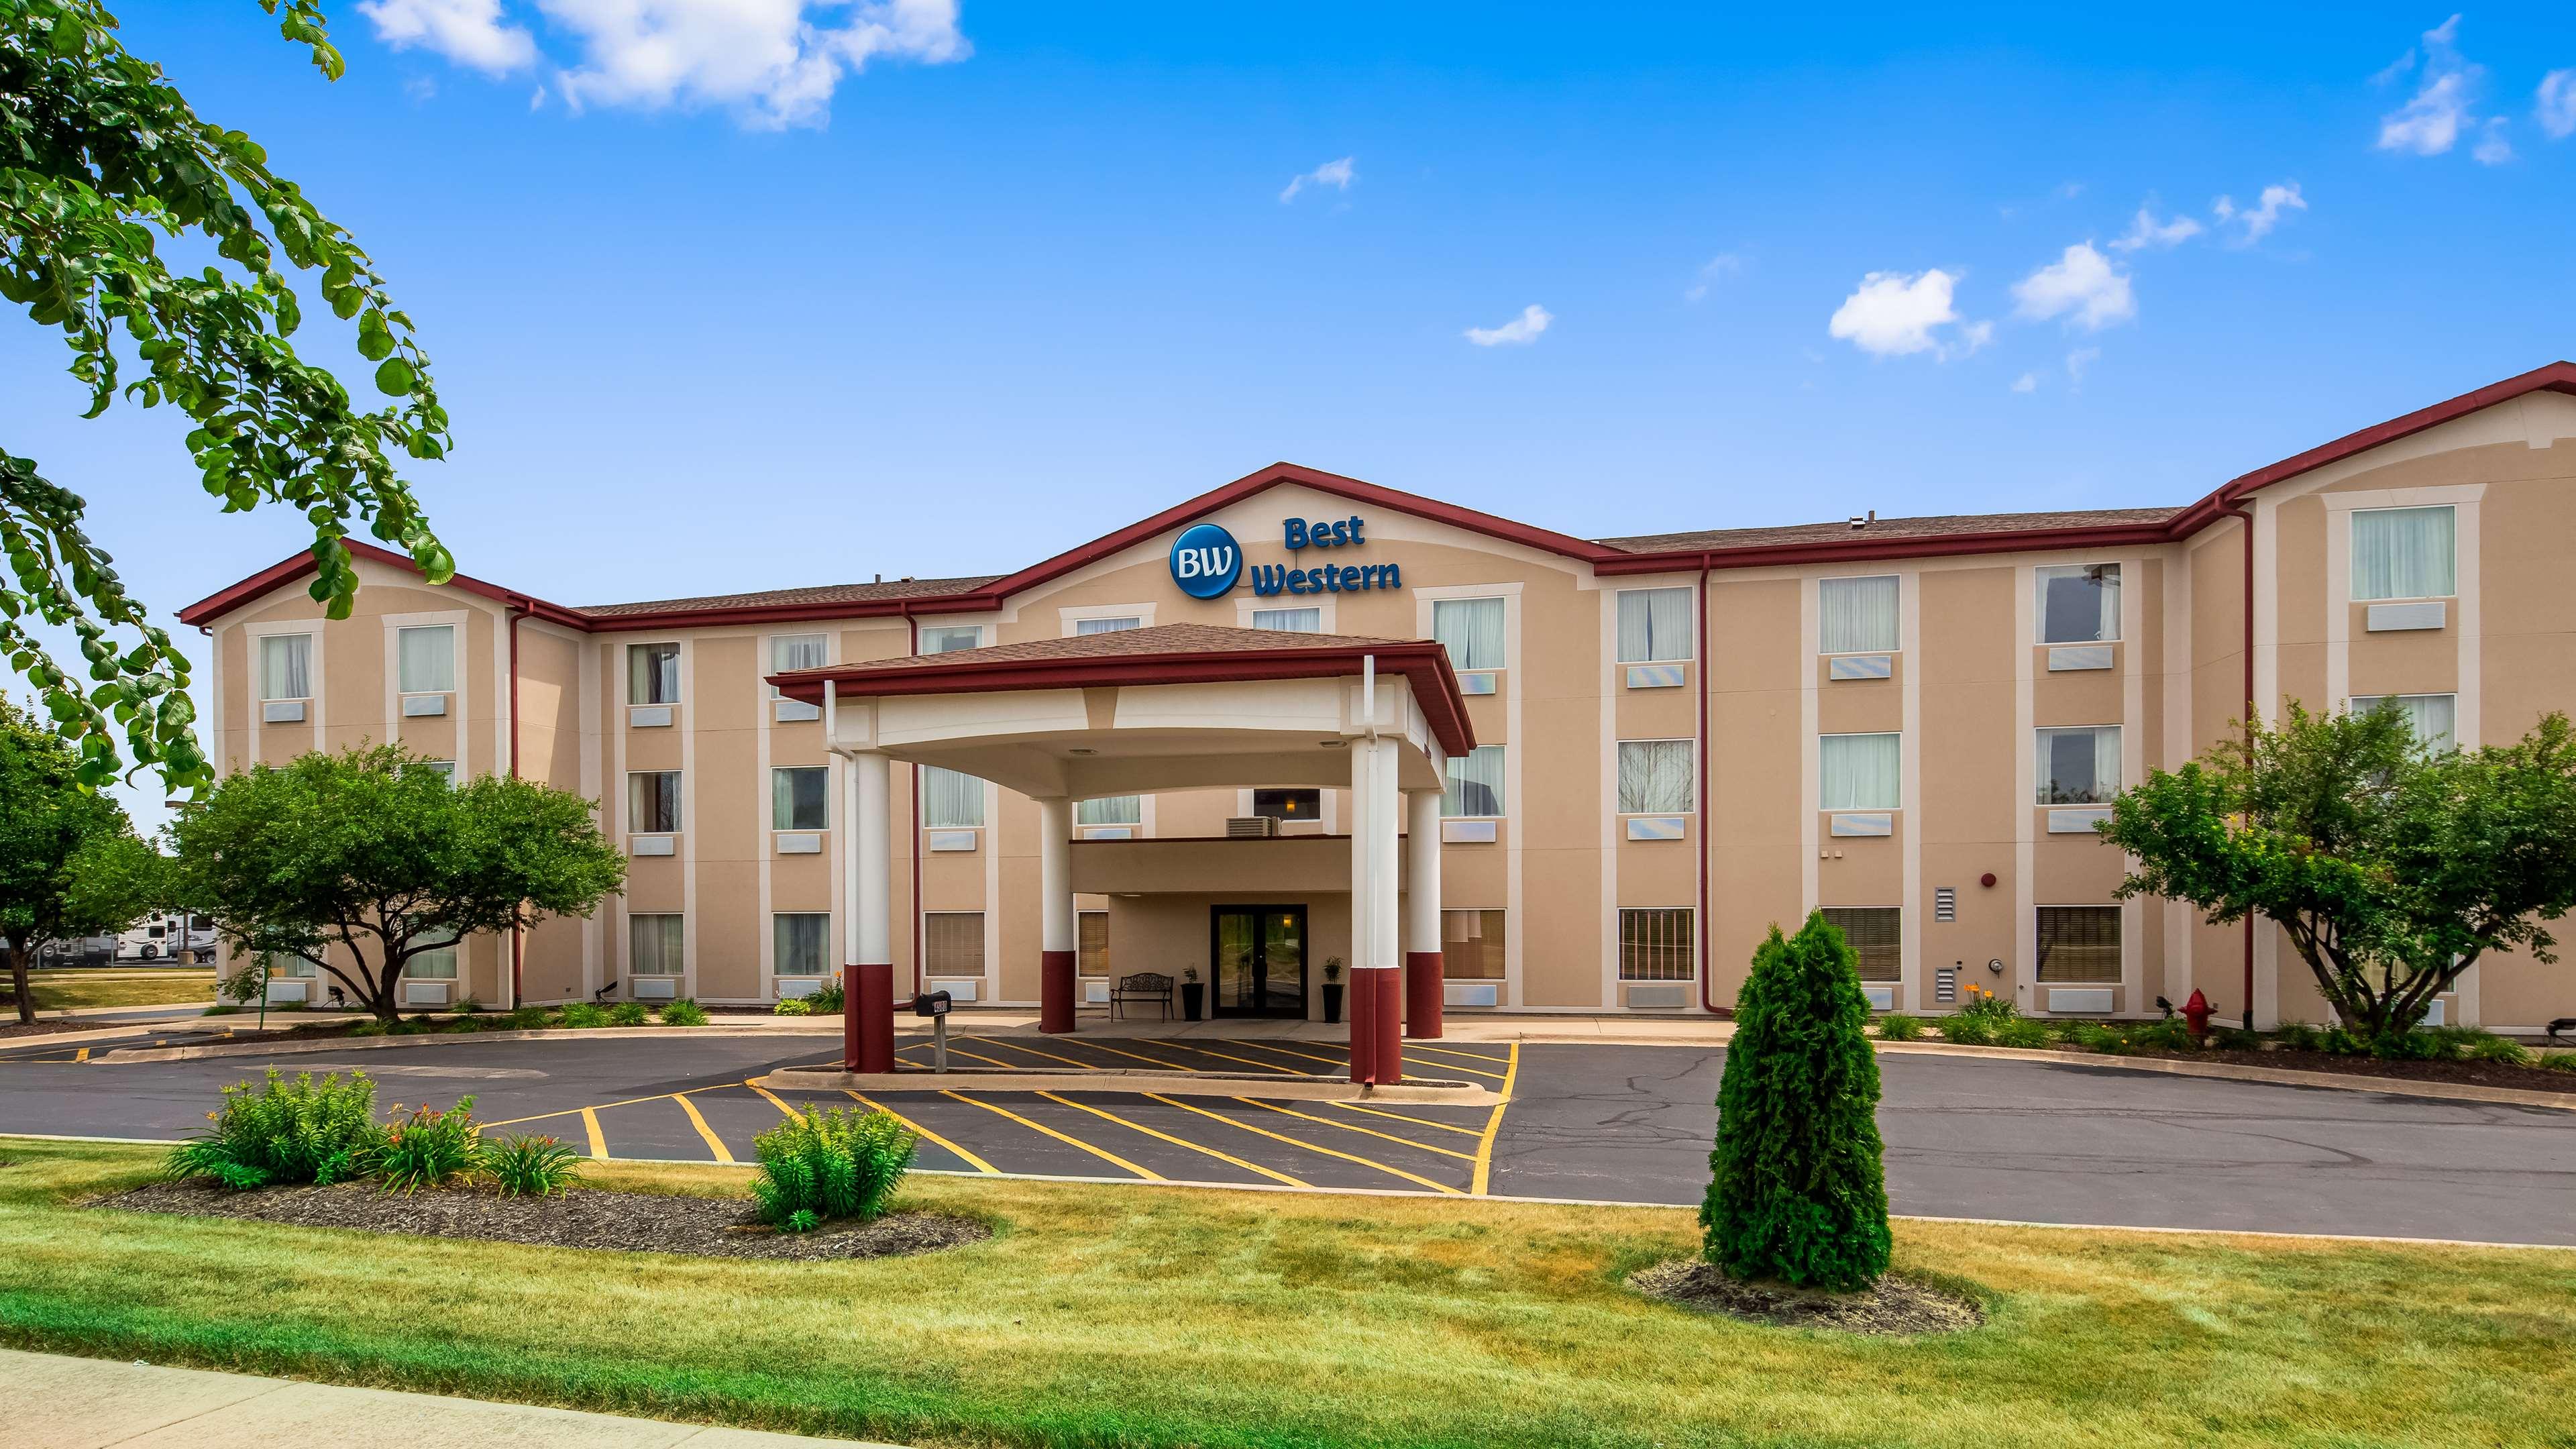 Best Western Joliet Inn & Suites image 1